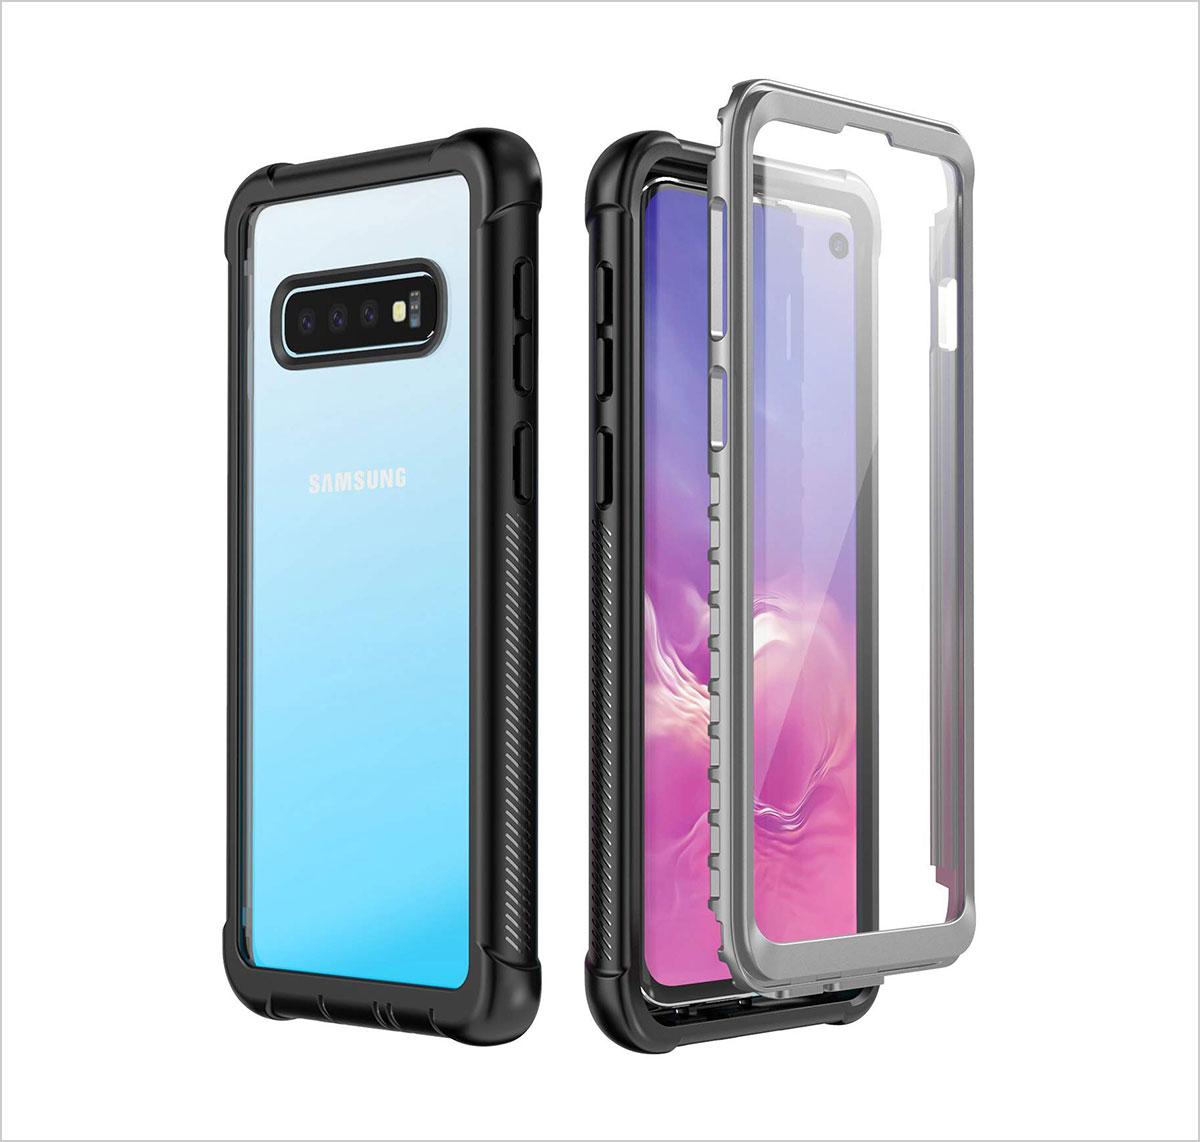 Samsung-Galaxy-S10-Case-Temdan-Built-in-Screen-Protector